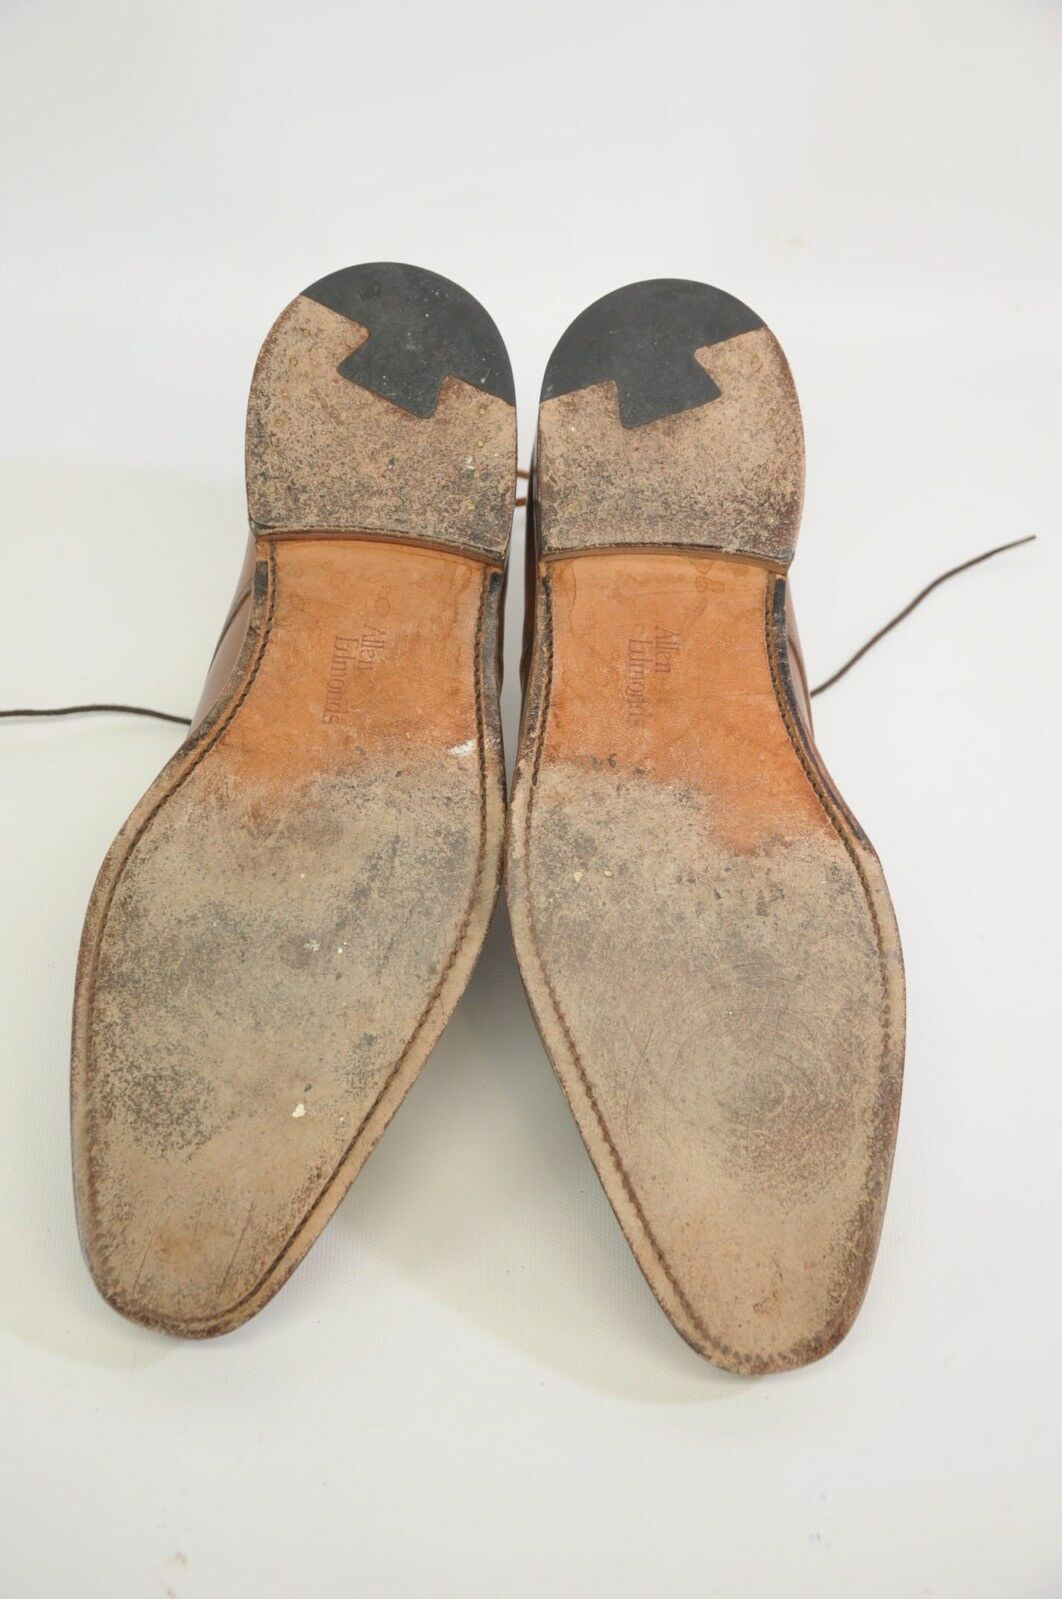 Allen Moc Edmonds Charleston Braun Leder Moc Allen Toe Oxfords Dress Schuhes 9 D fae3df